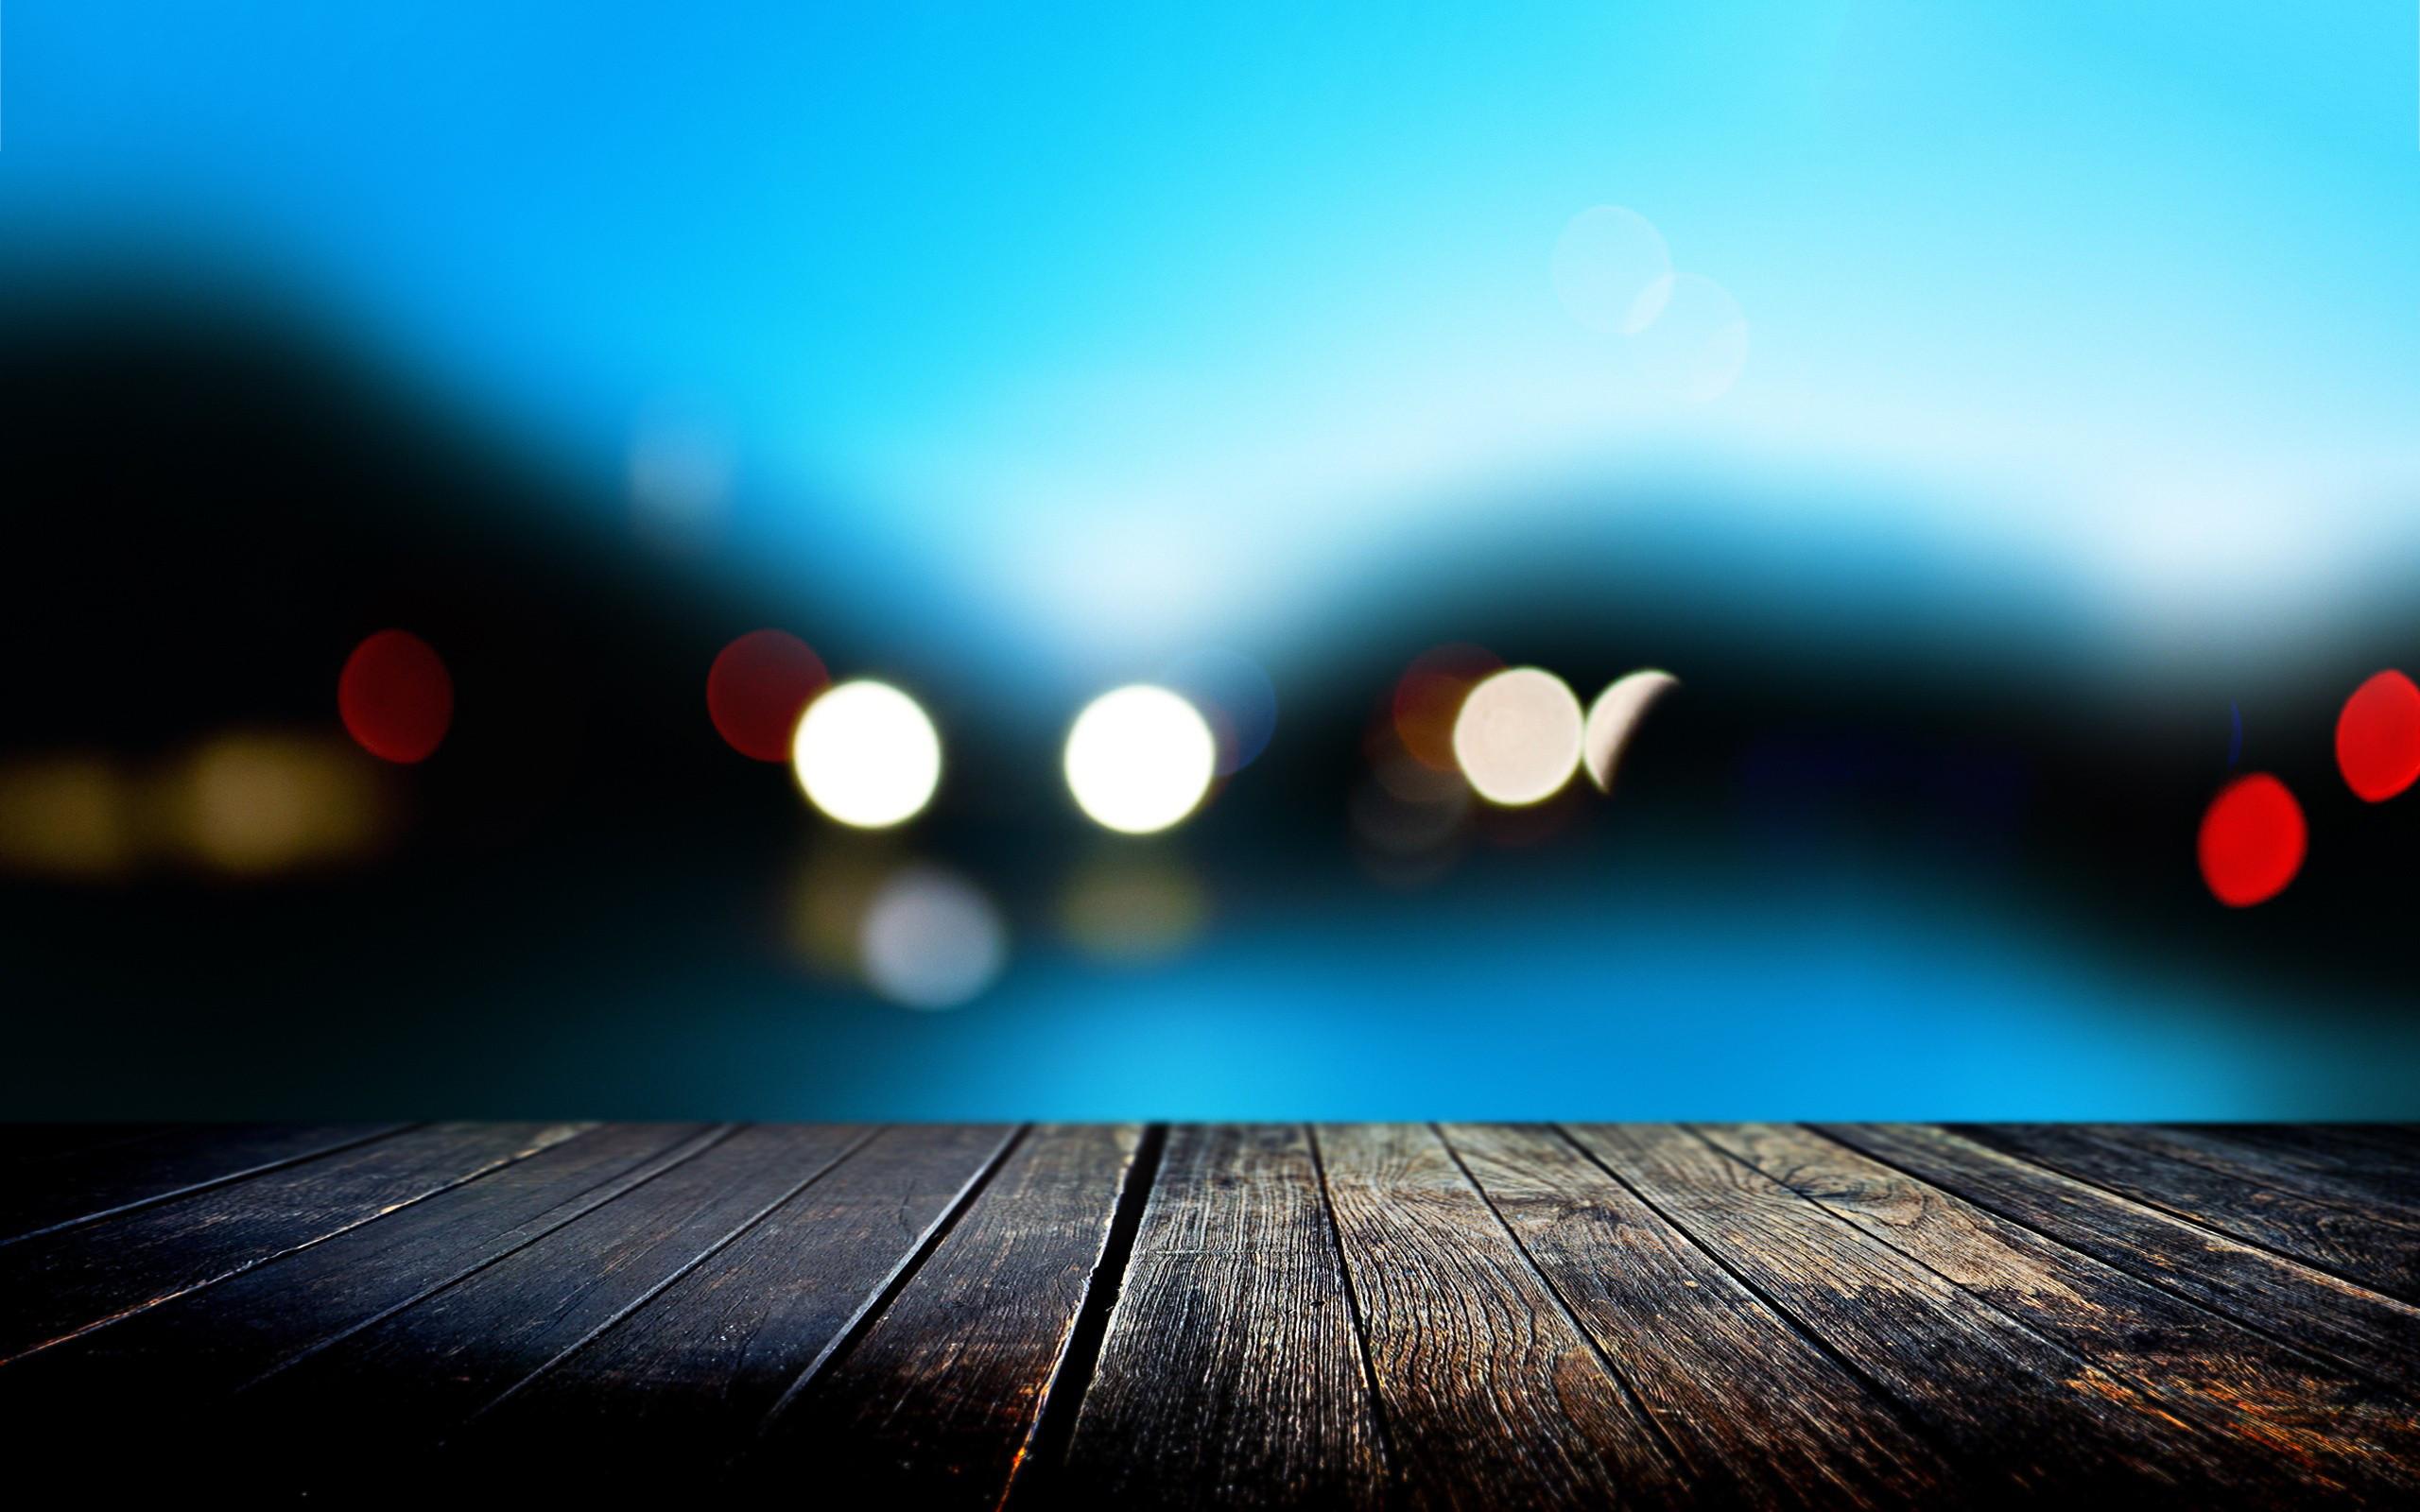 Pier evening lights